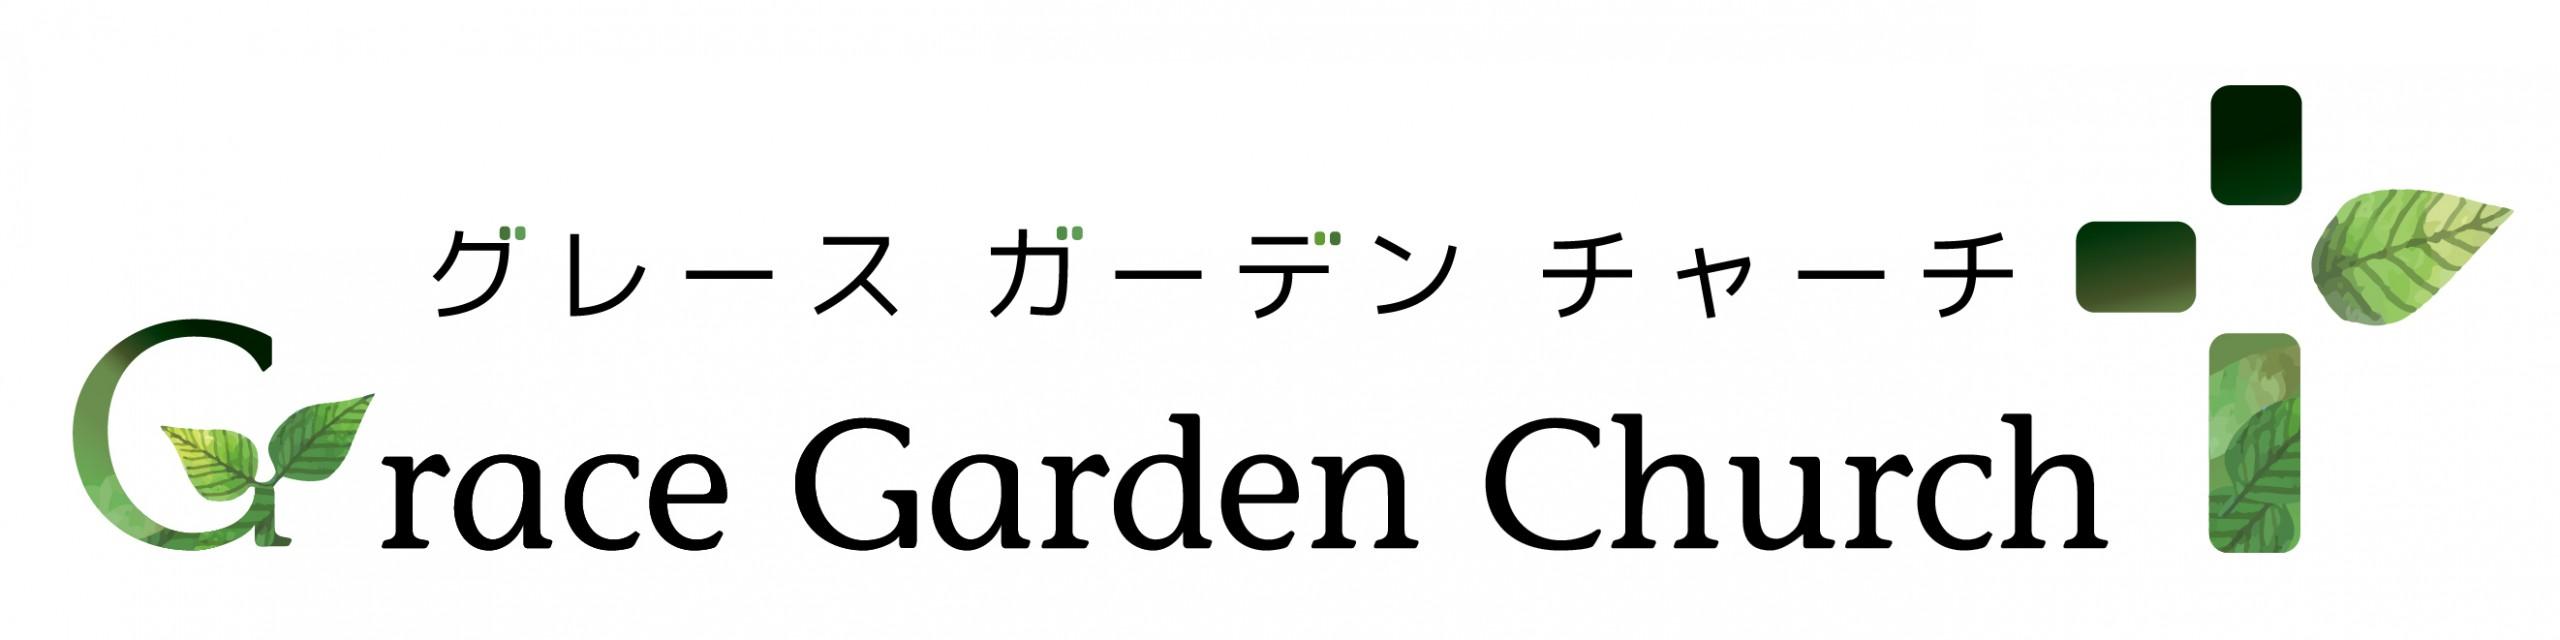 Grace Garden Church┃海老名 | 教会|プロテスタント